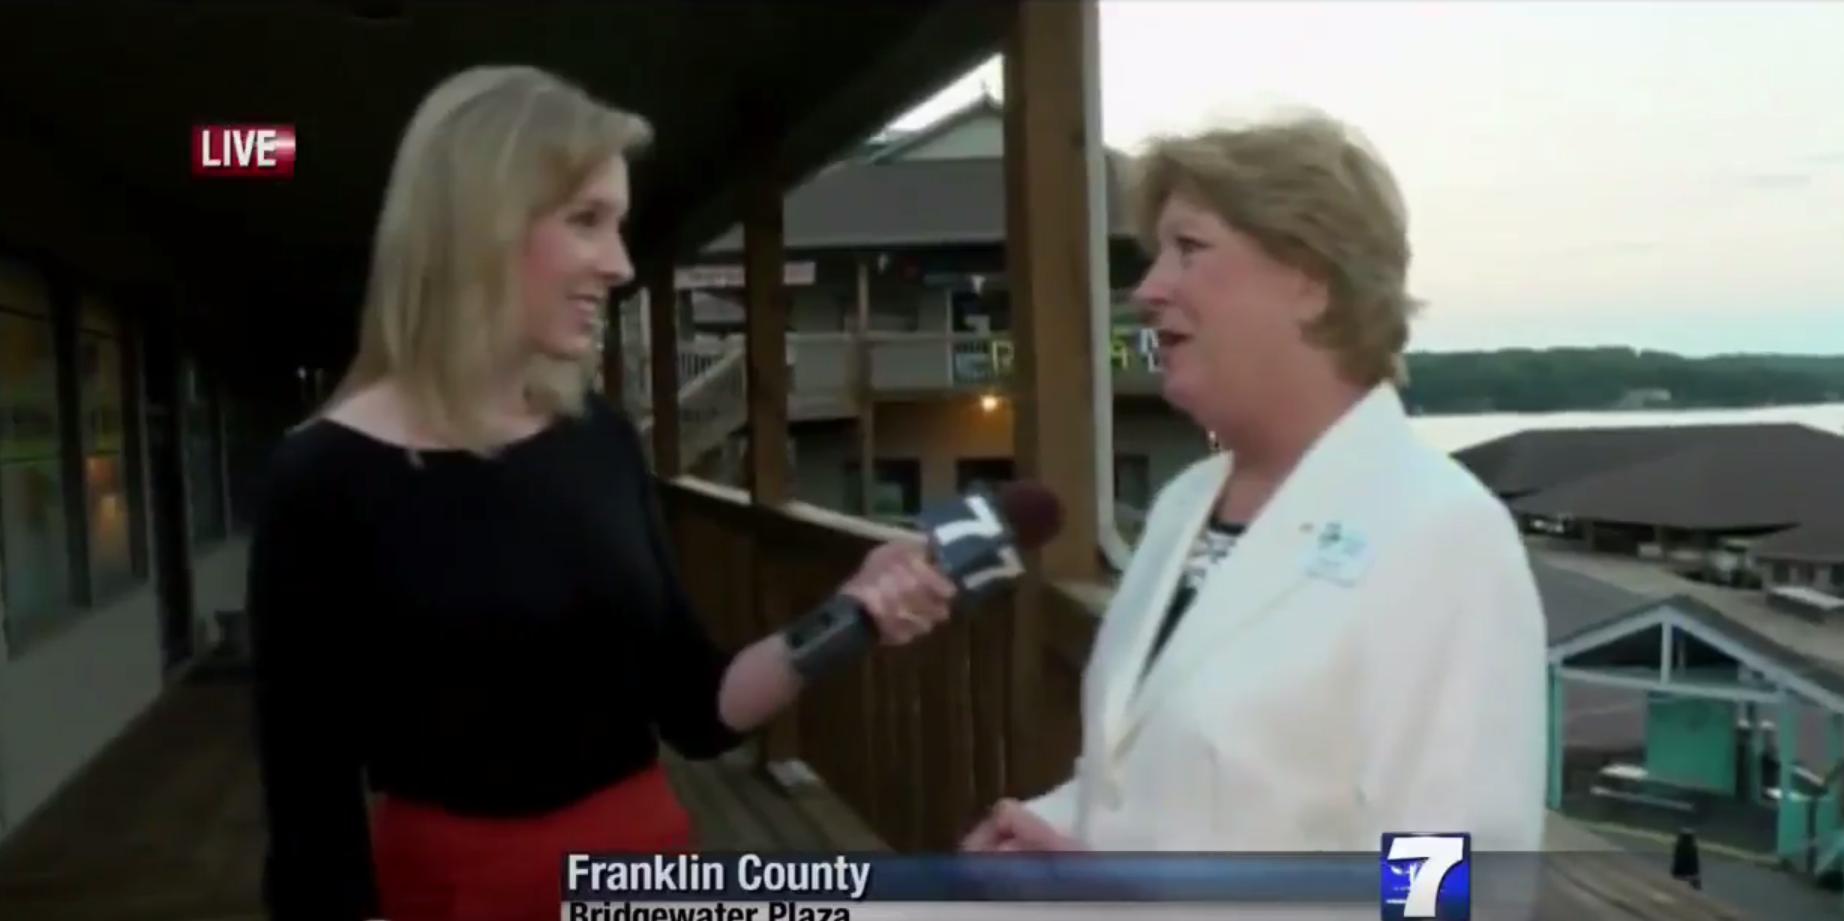 Alison Parker interviews a woman seconds before shots rang out